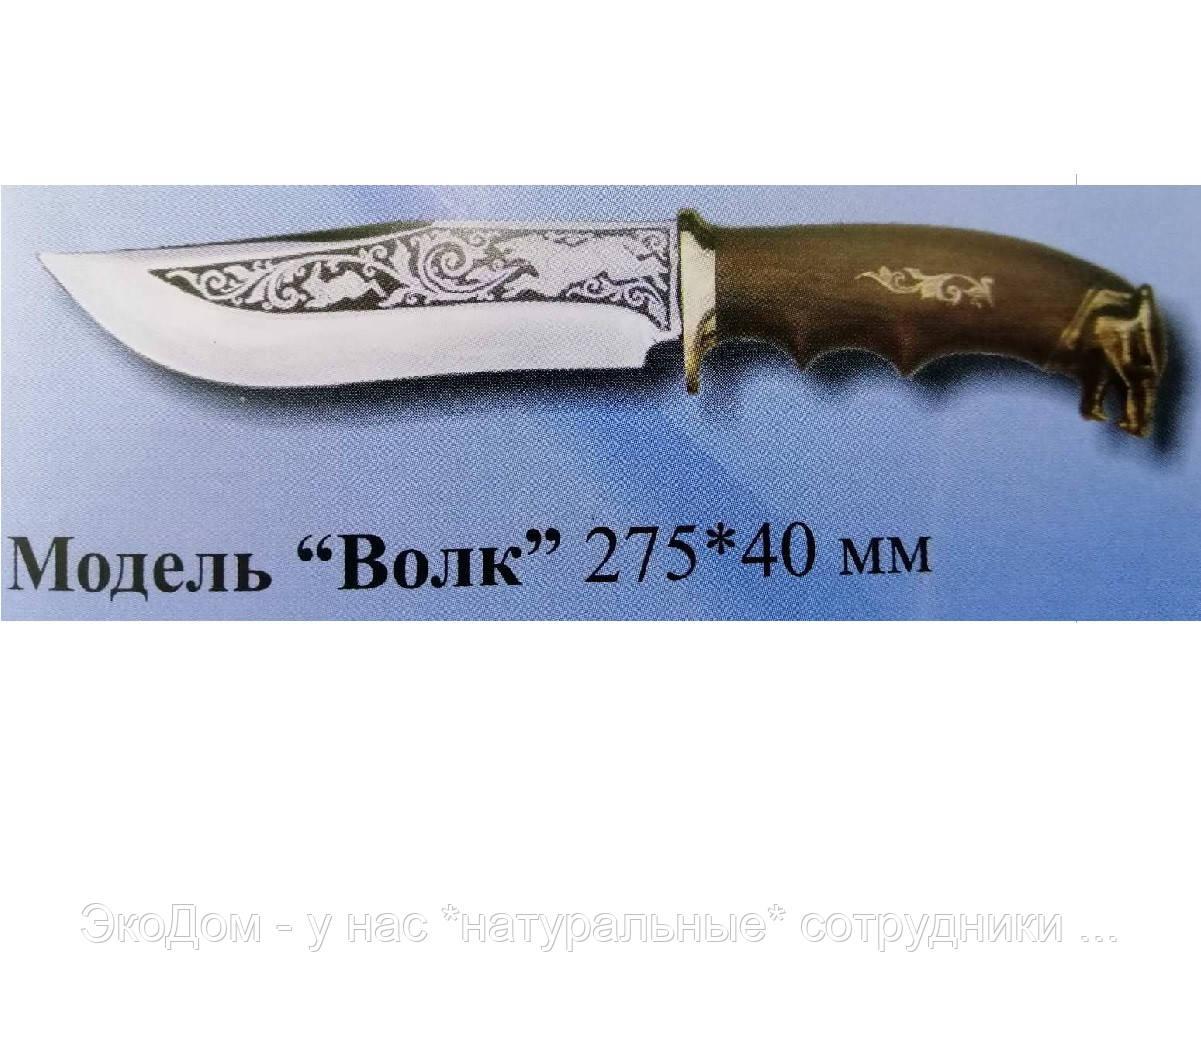 "Нож туристический ""Волк"""